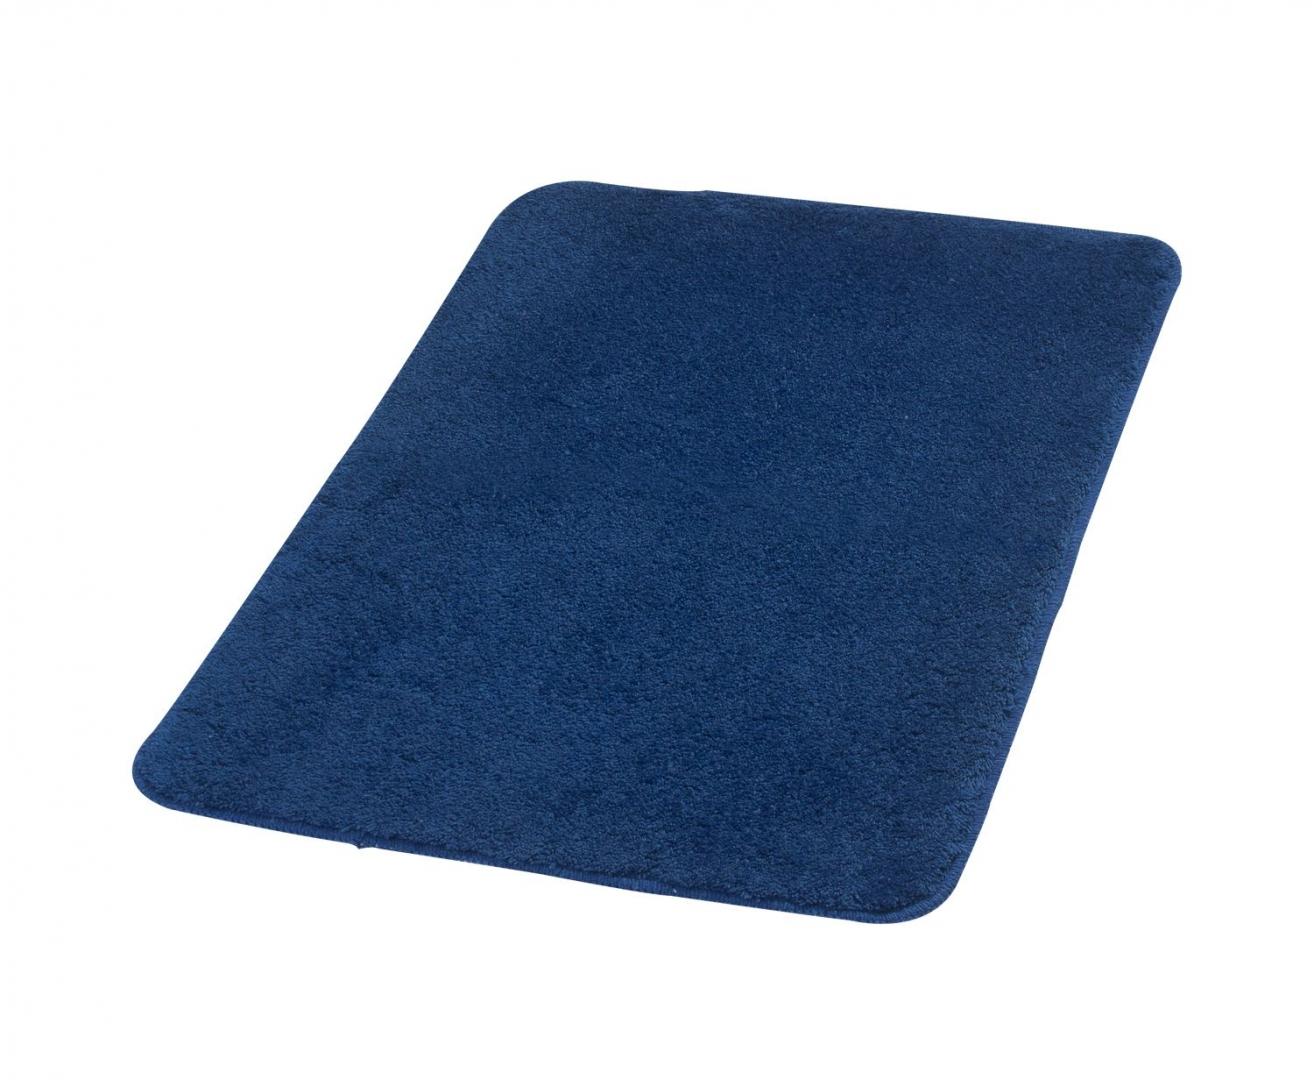 Коврик для ванной комнаты Palma синий/голубой 60*90